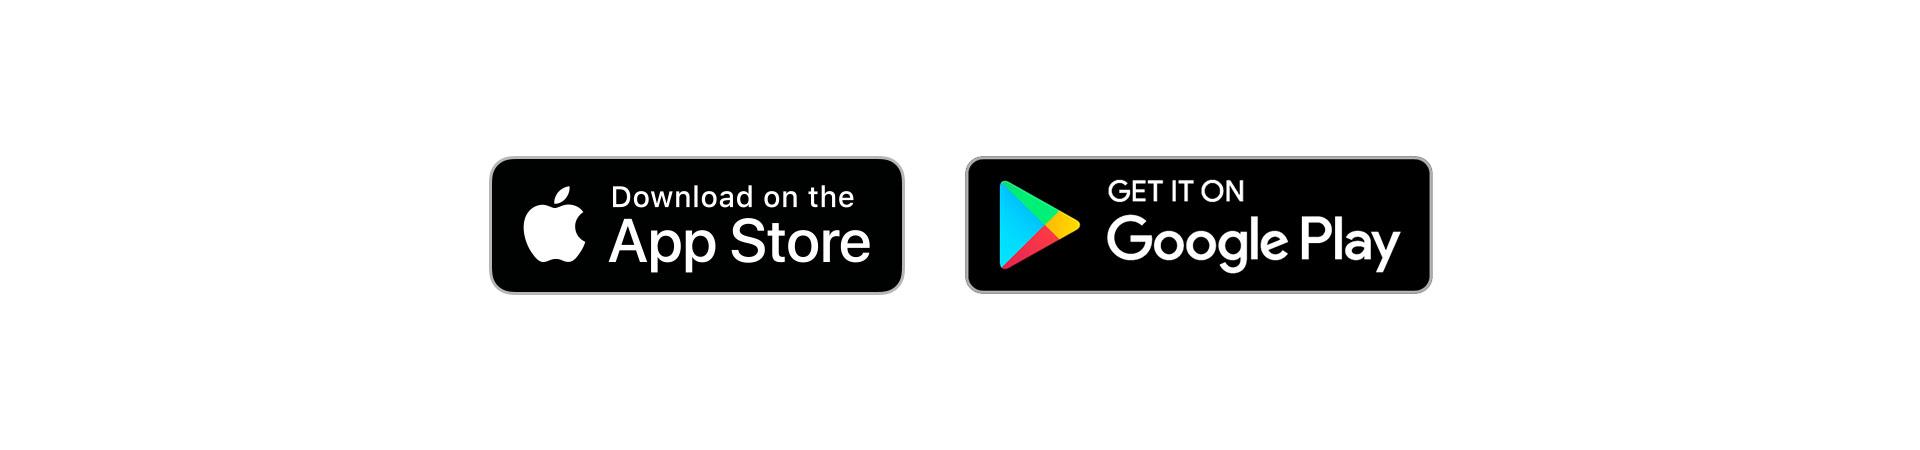 Mobile-Logos